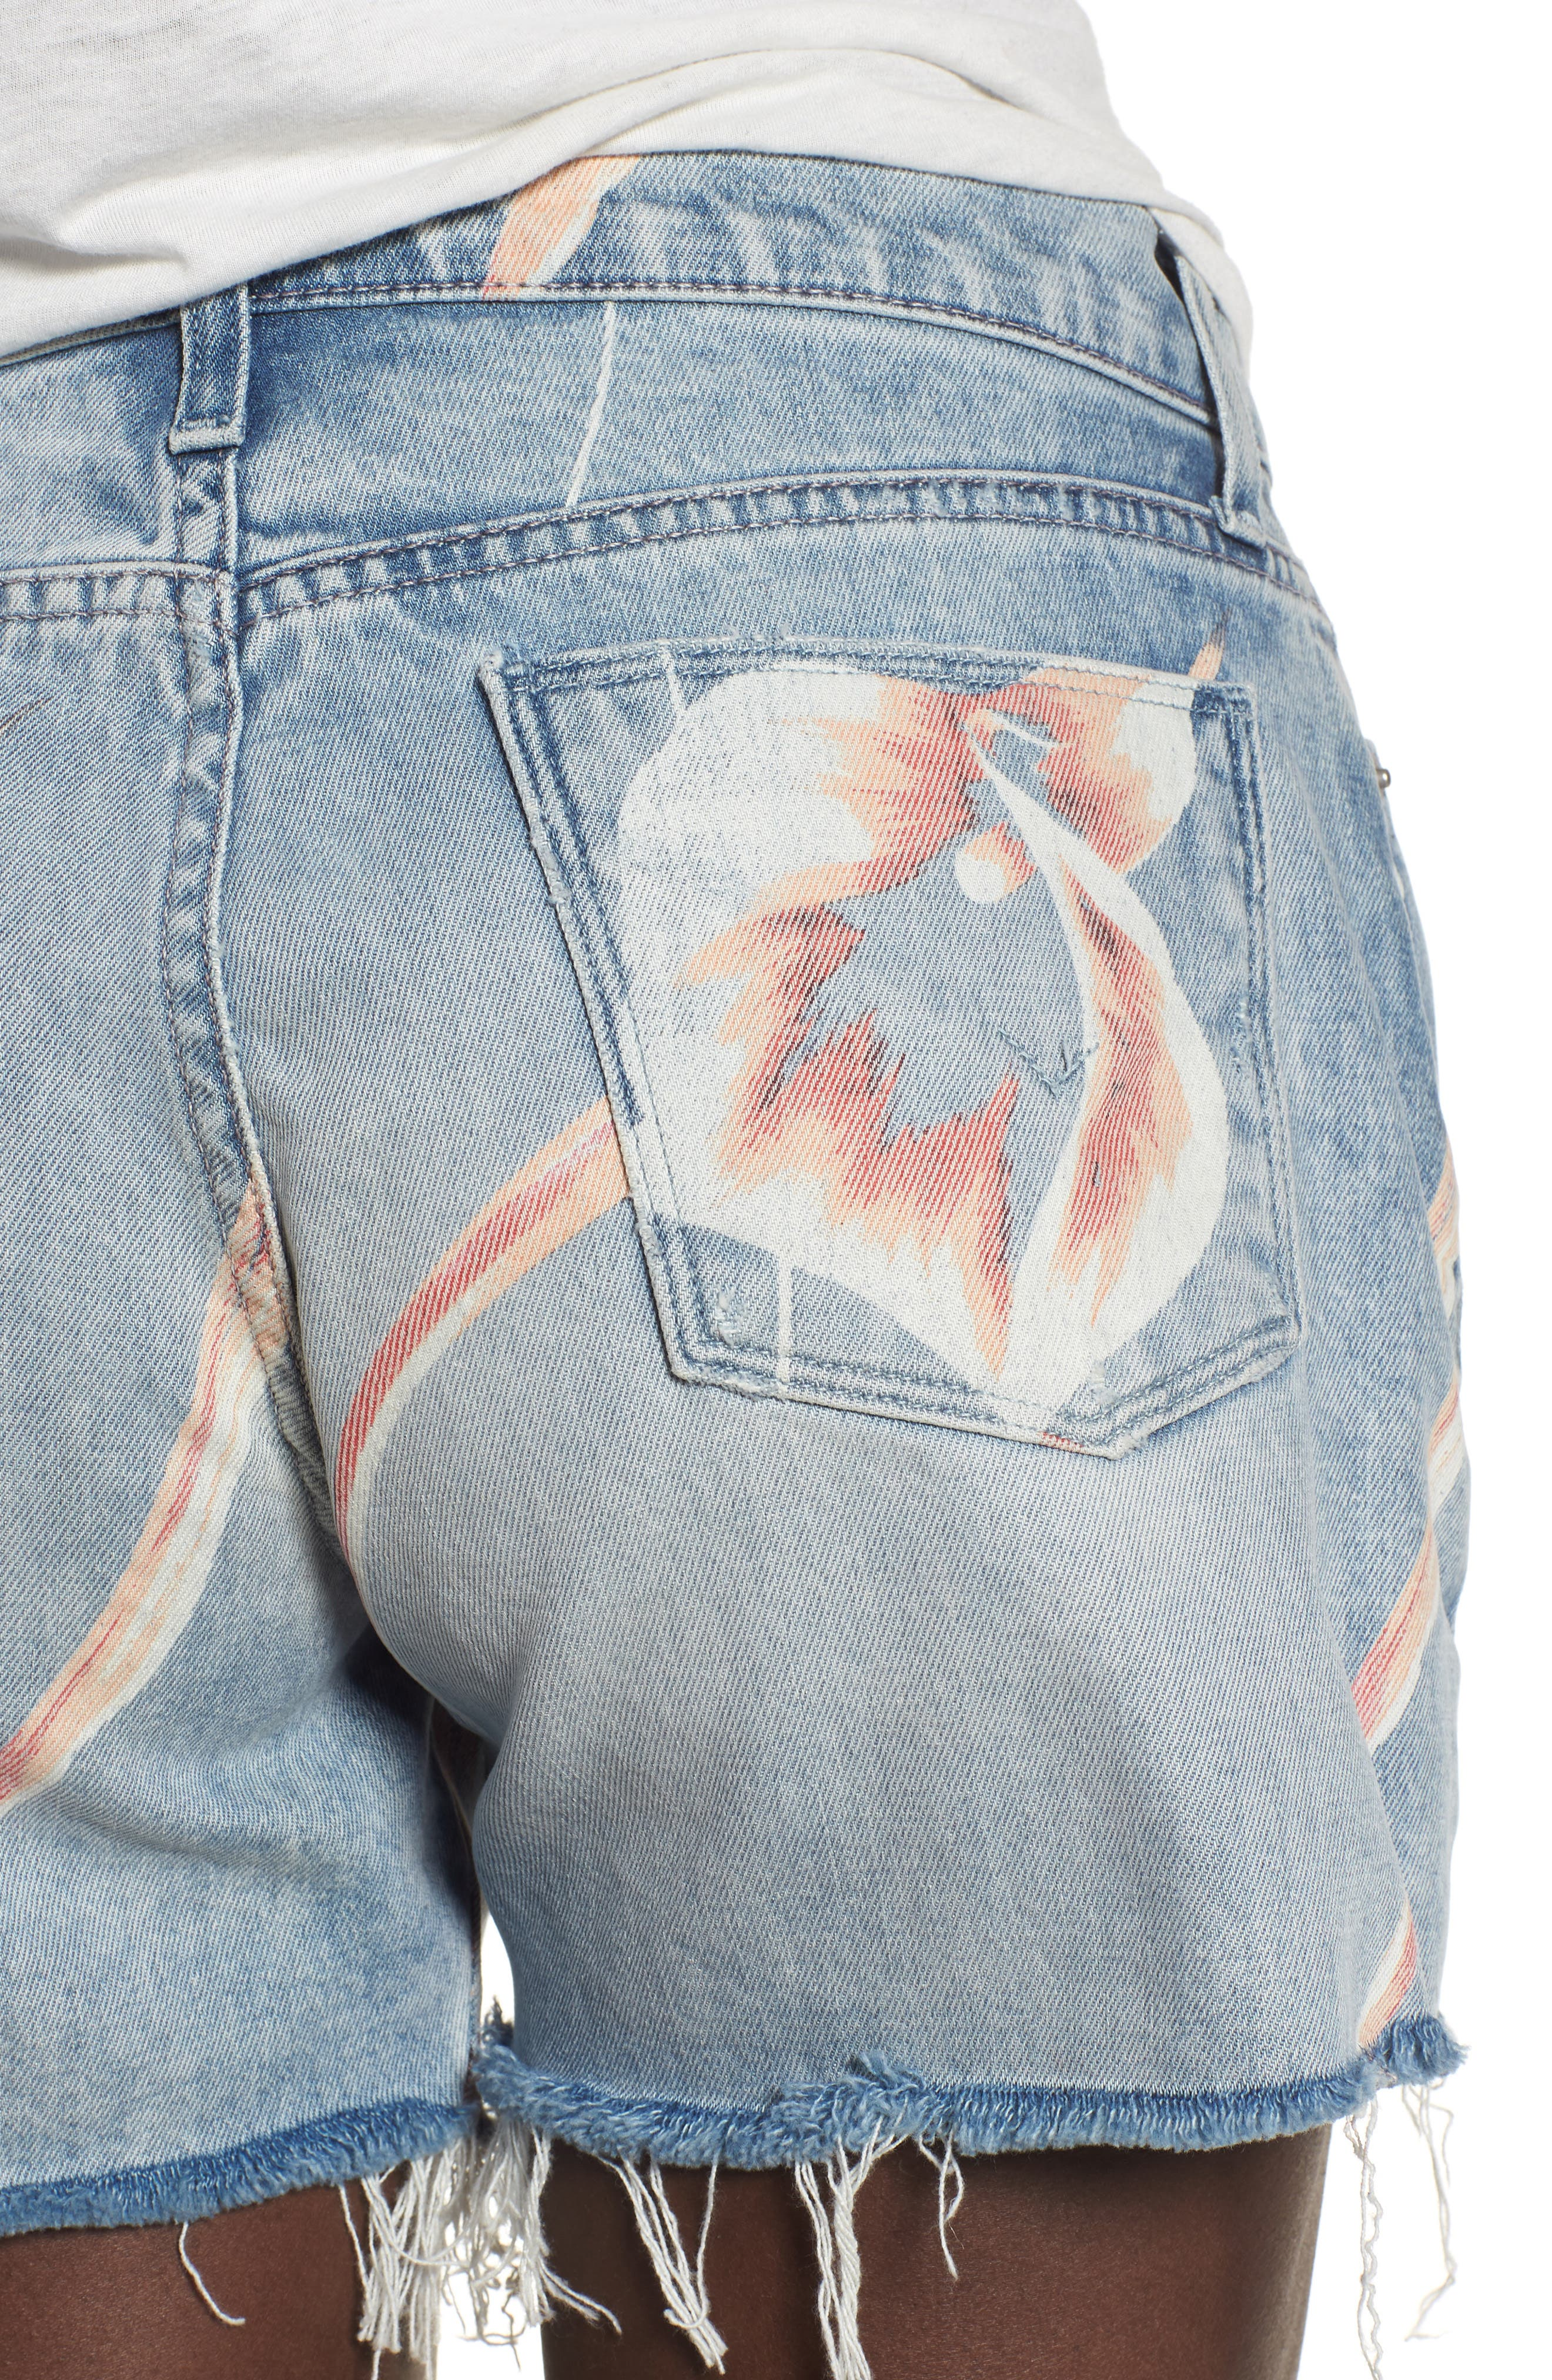 Valeri Painted Denim Shorts,                             Alternate thumbnail 4, color,                             001